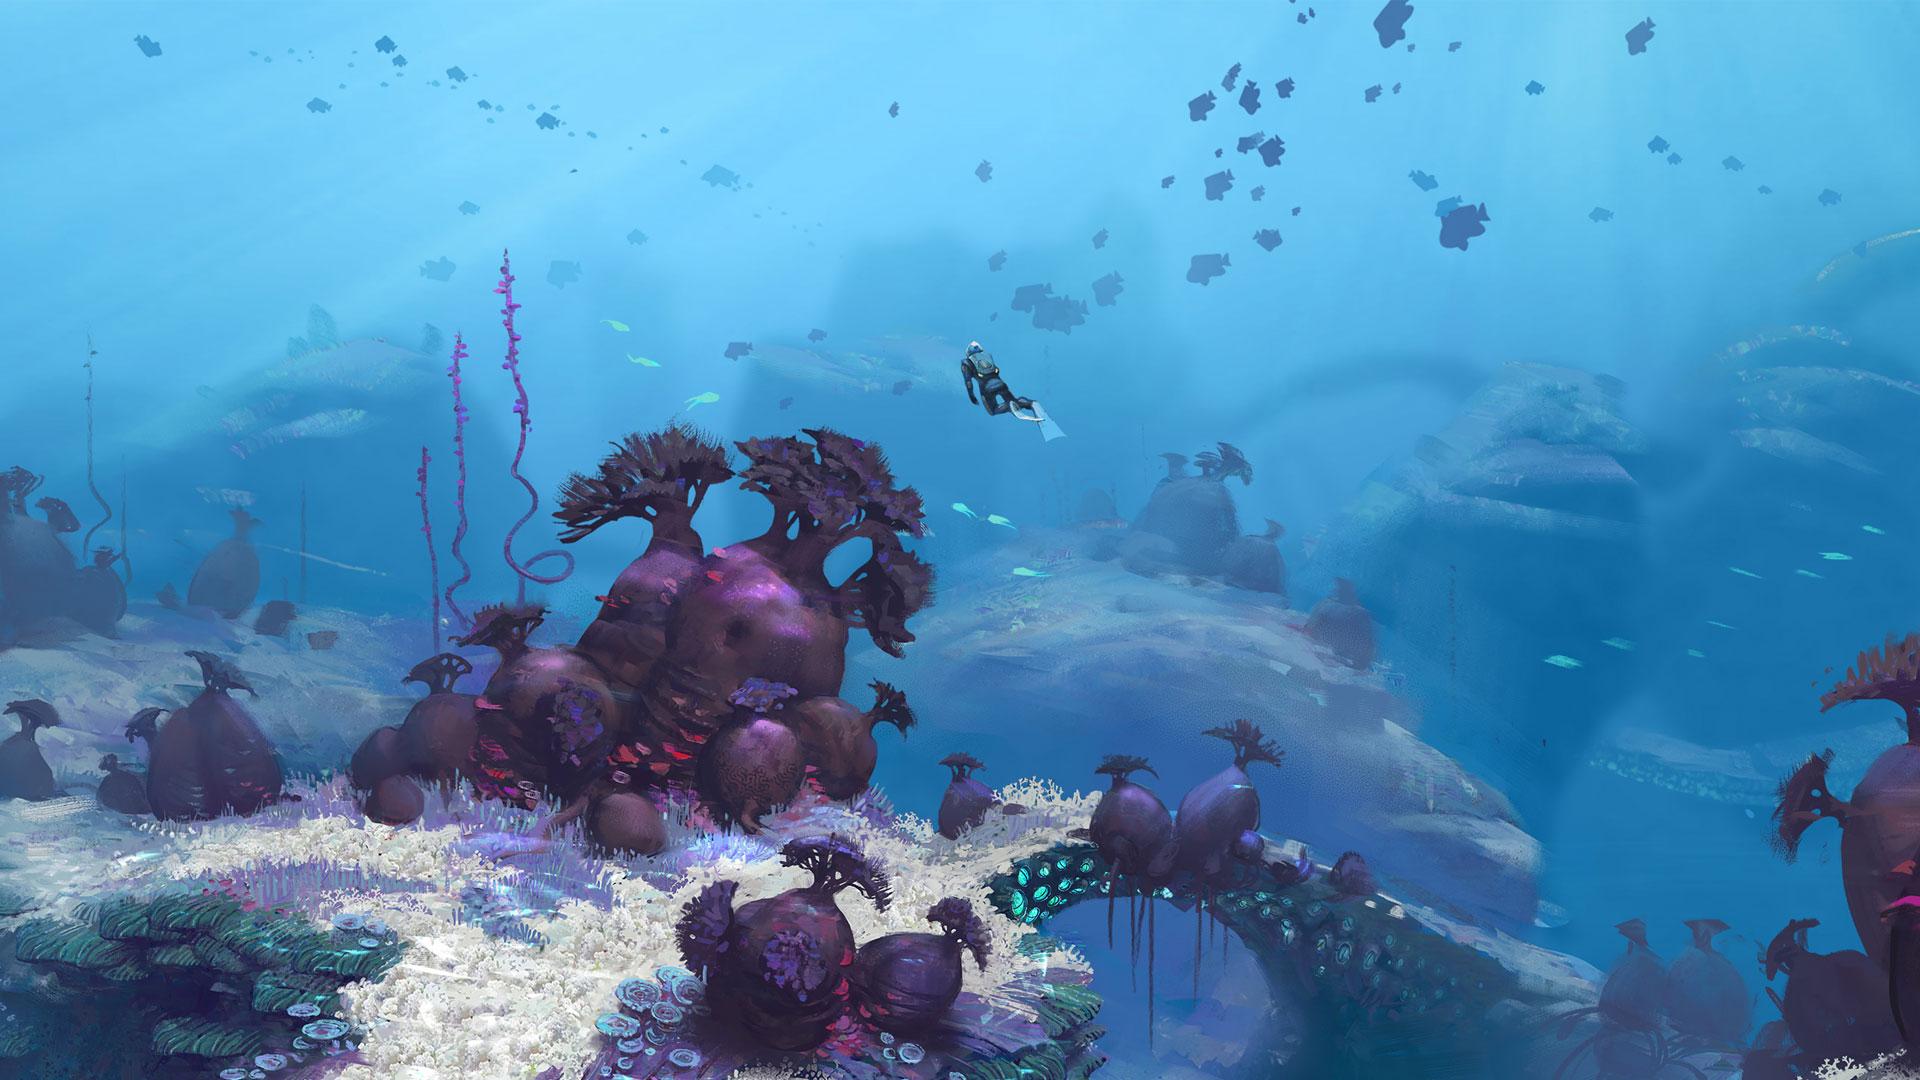 Subnautica Below Zero Wallpapers | Backgrounds - Read games review, play online games & download ...